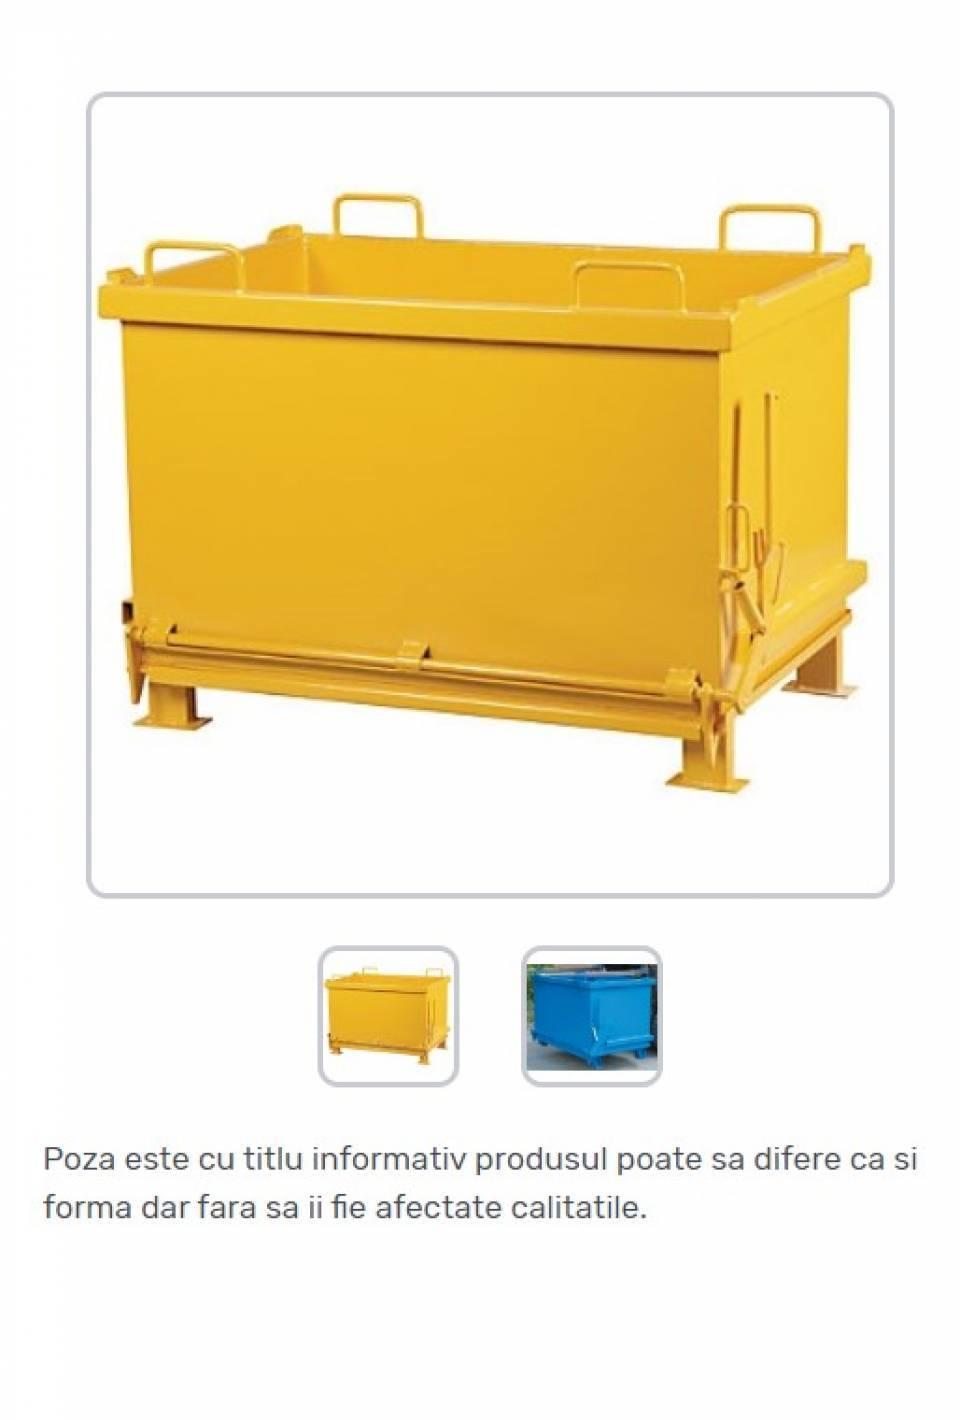 Container cu fund basculant pentru deseuri generale42181